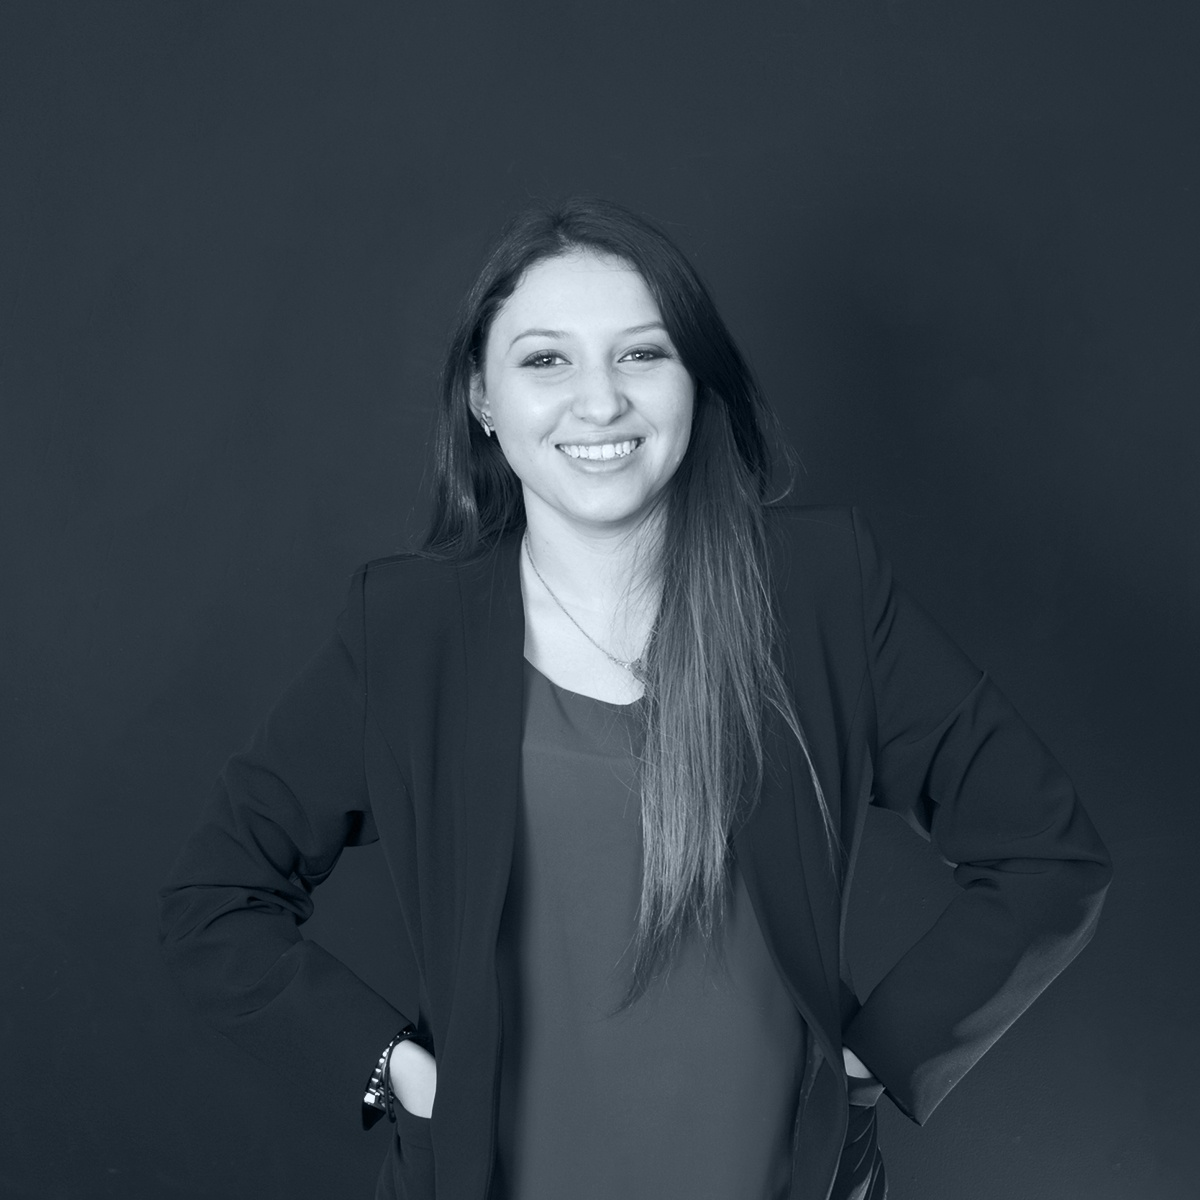 Jessica Guerra